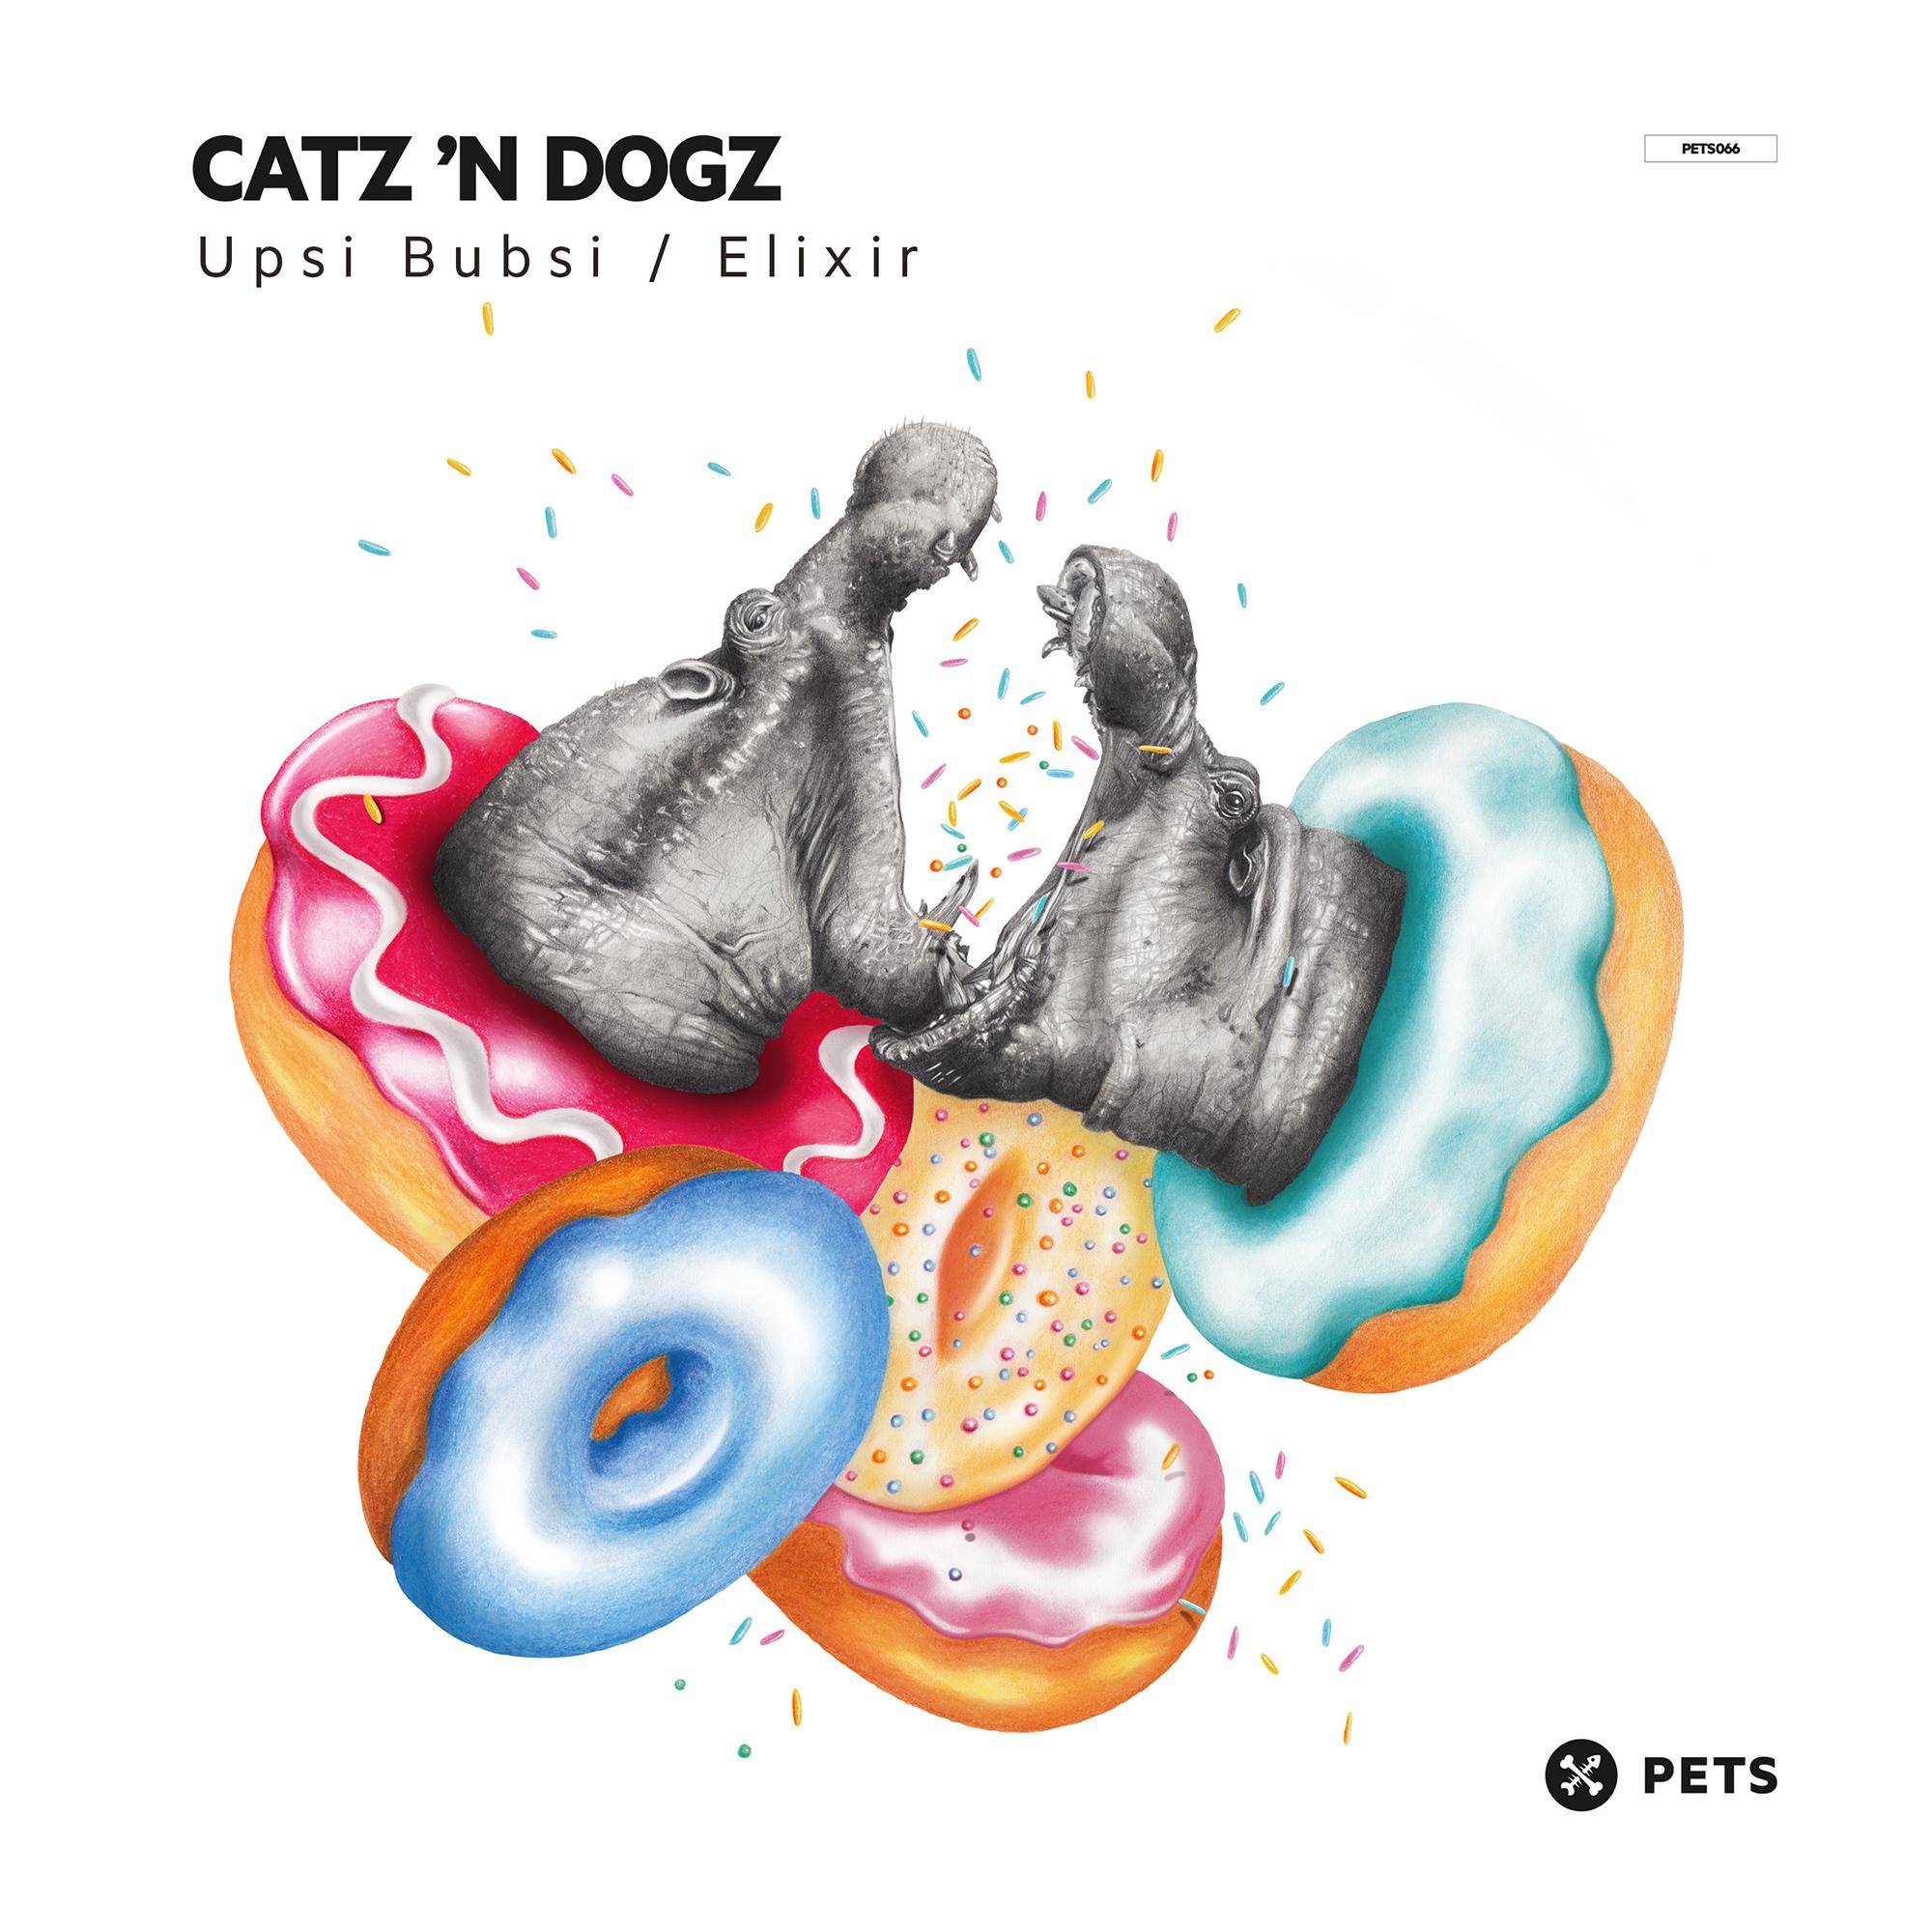 Catz 'n Dogz - Upsi Bubsi / Elixir [PETS066]